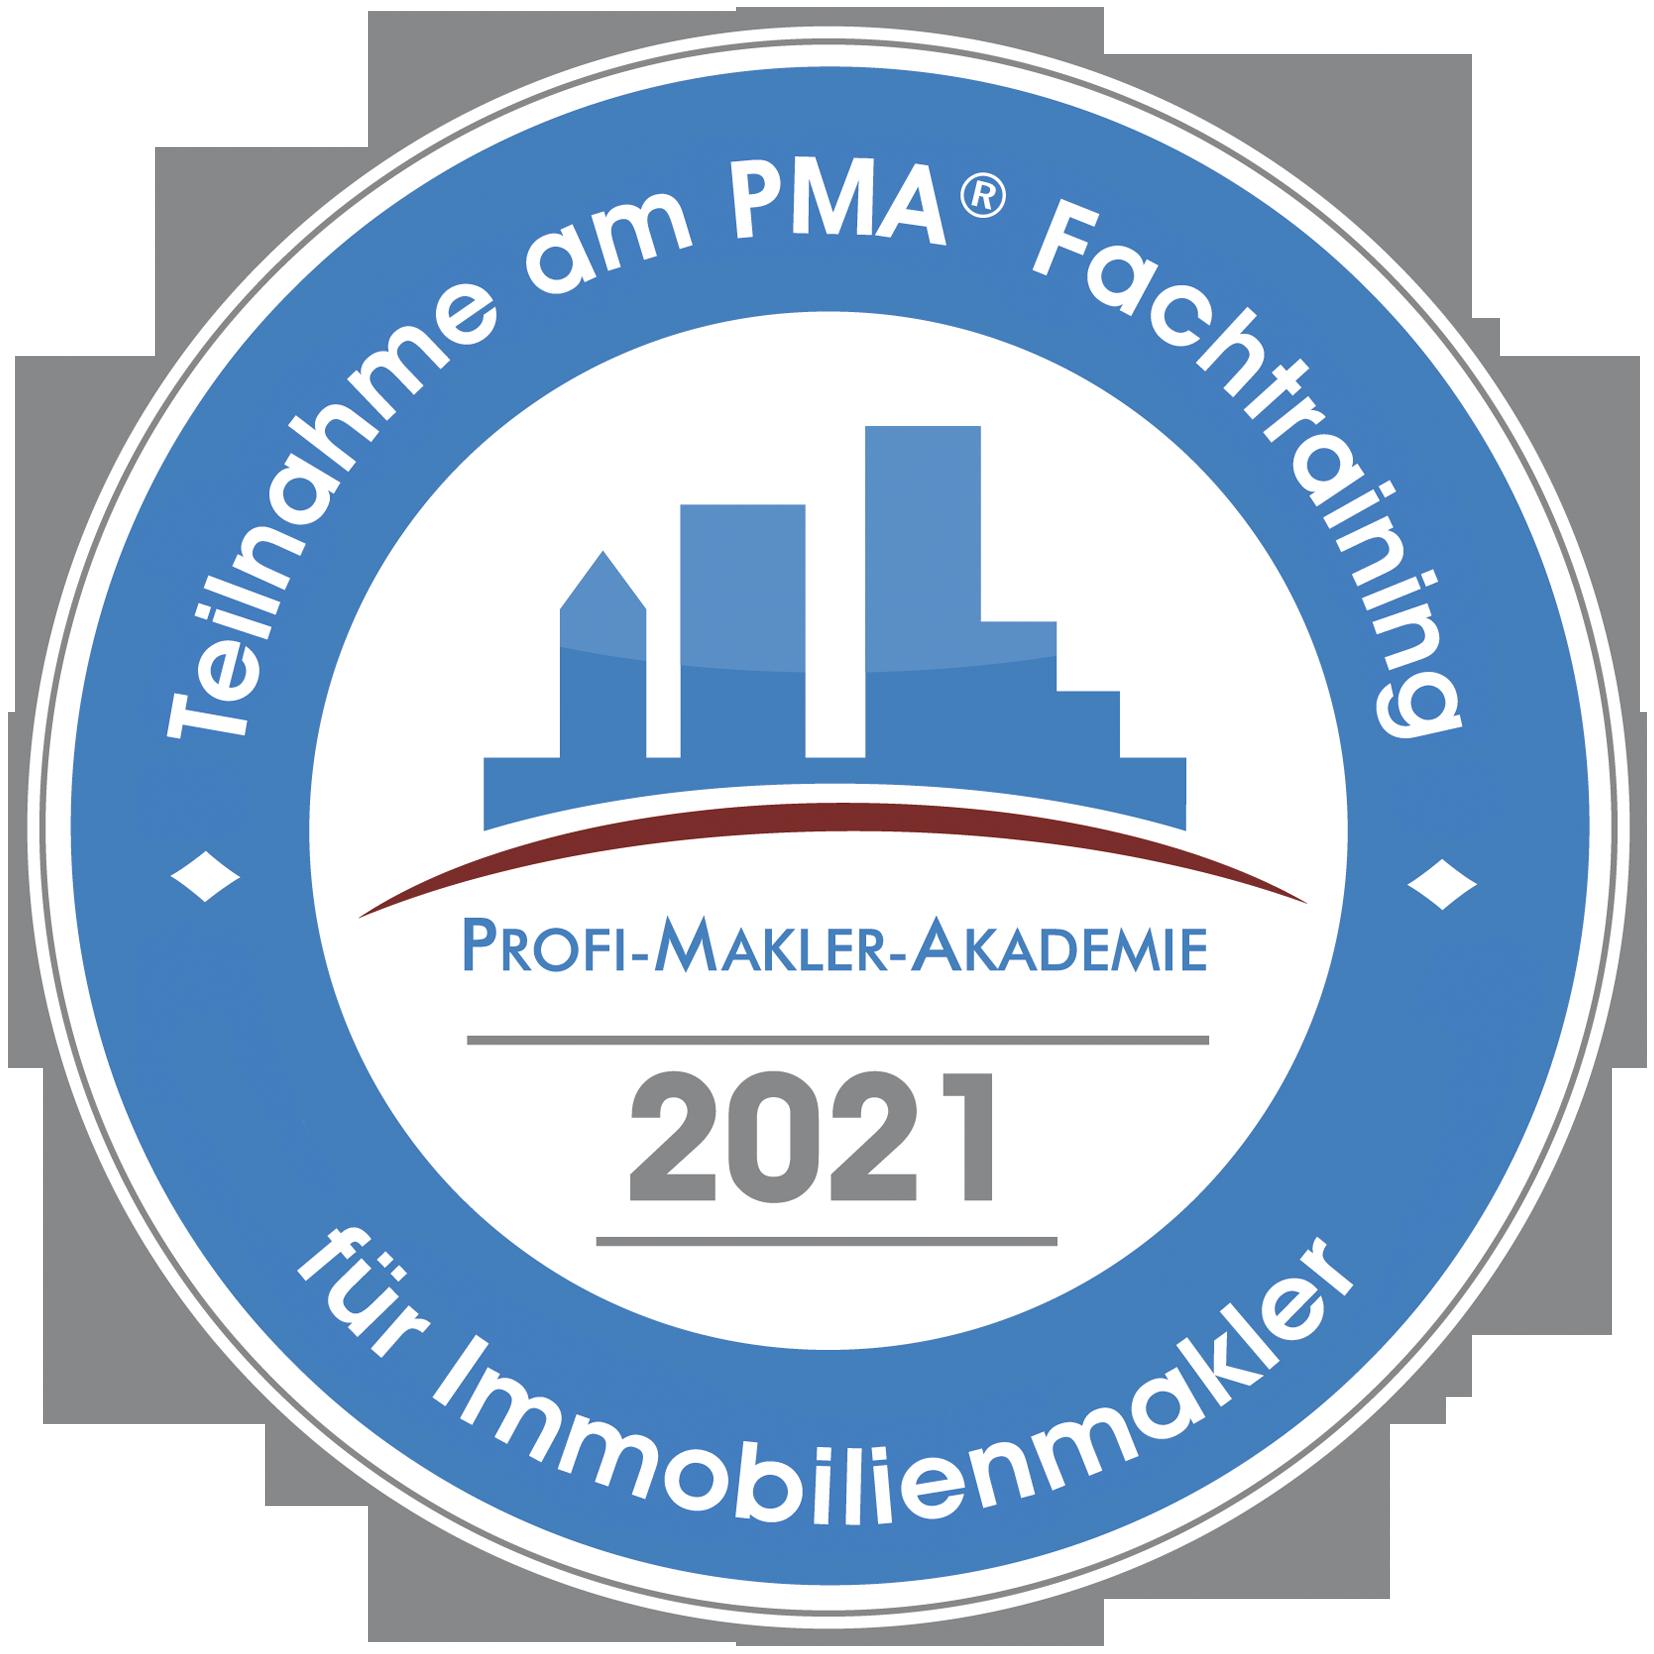 PMA Fachtraining 2021